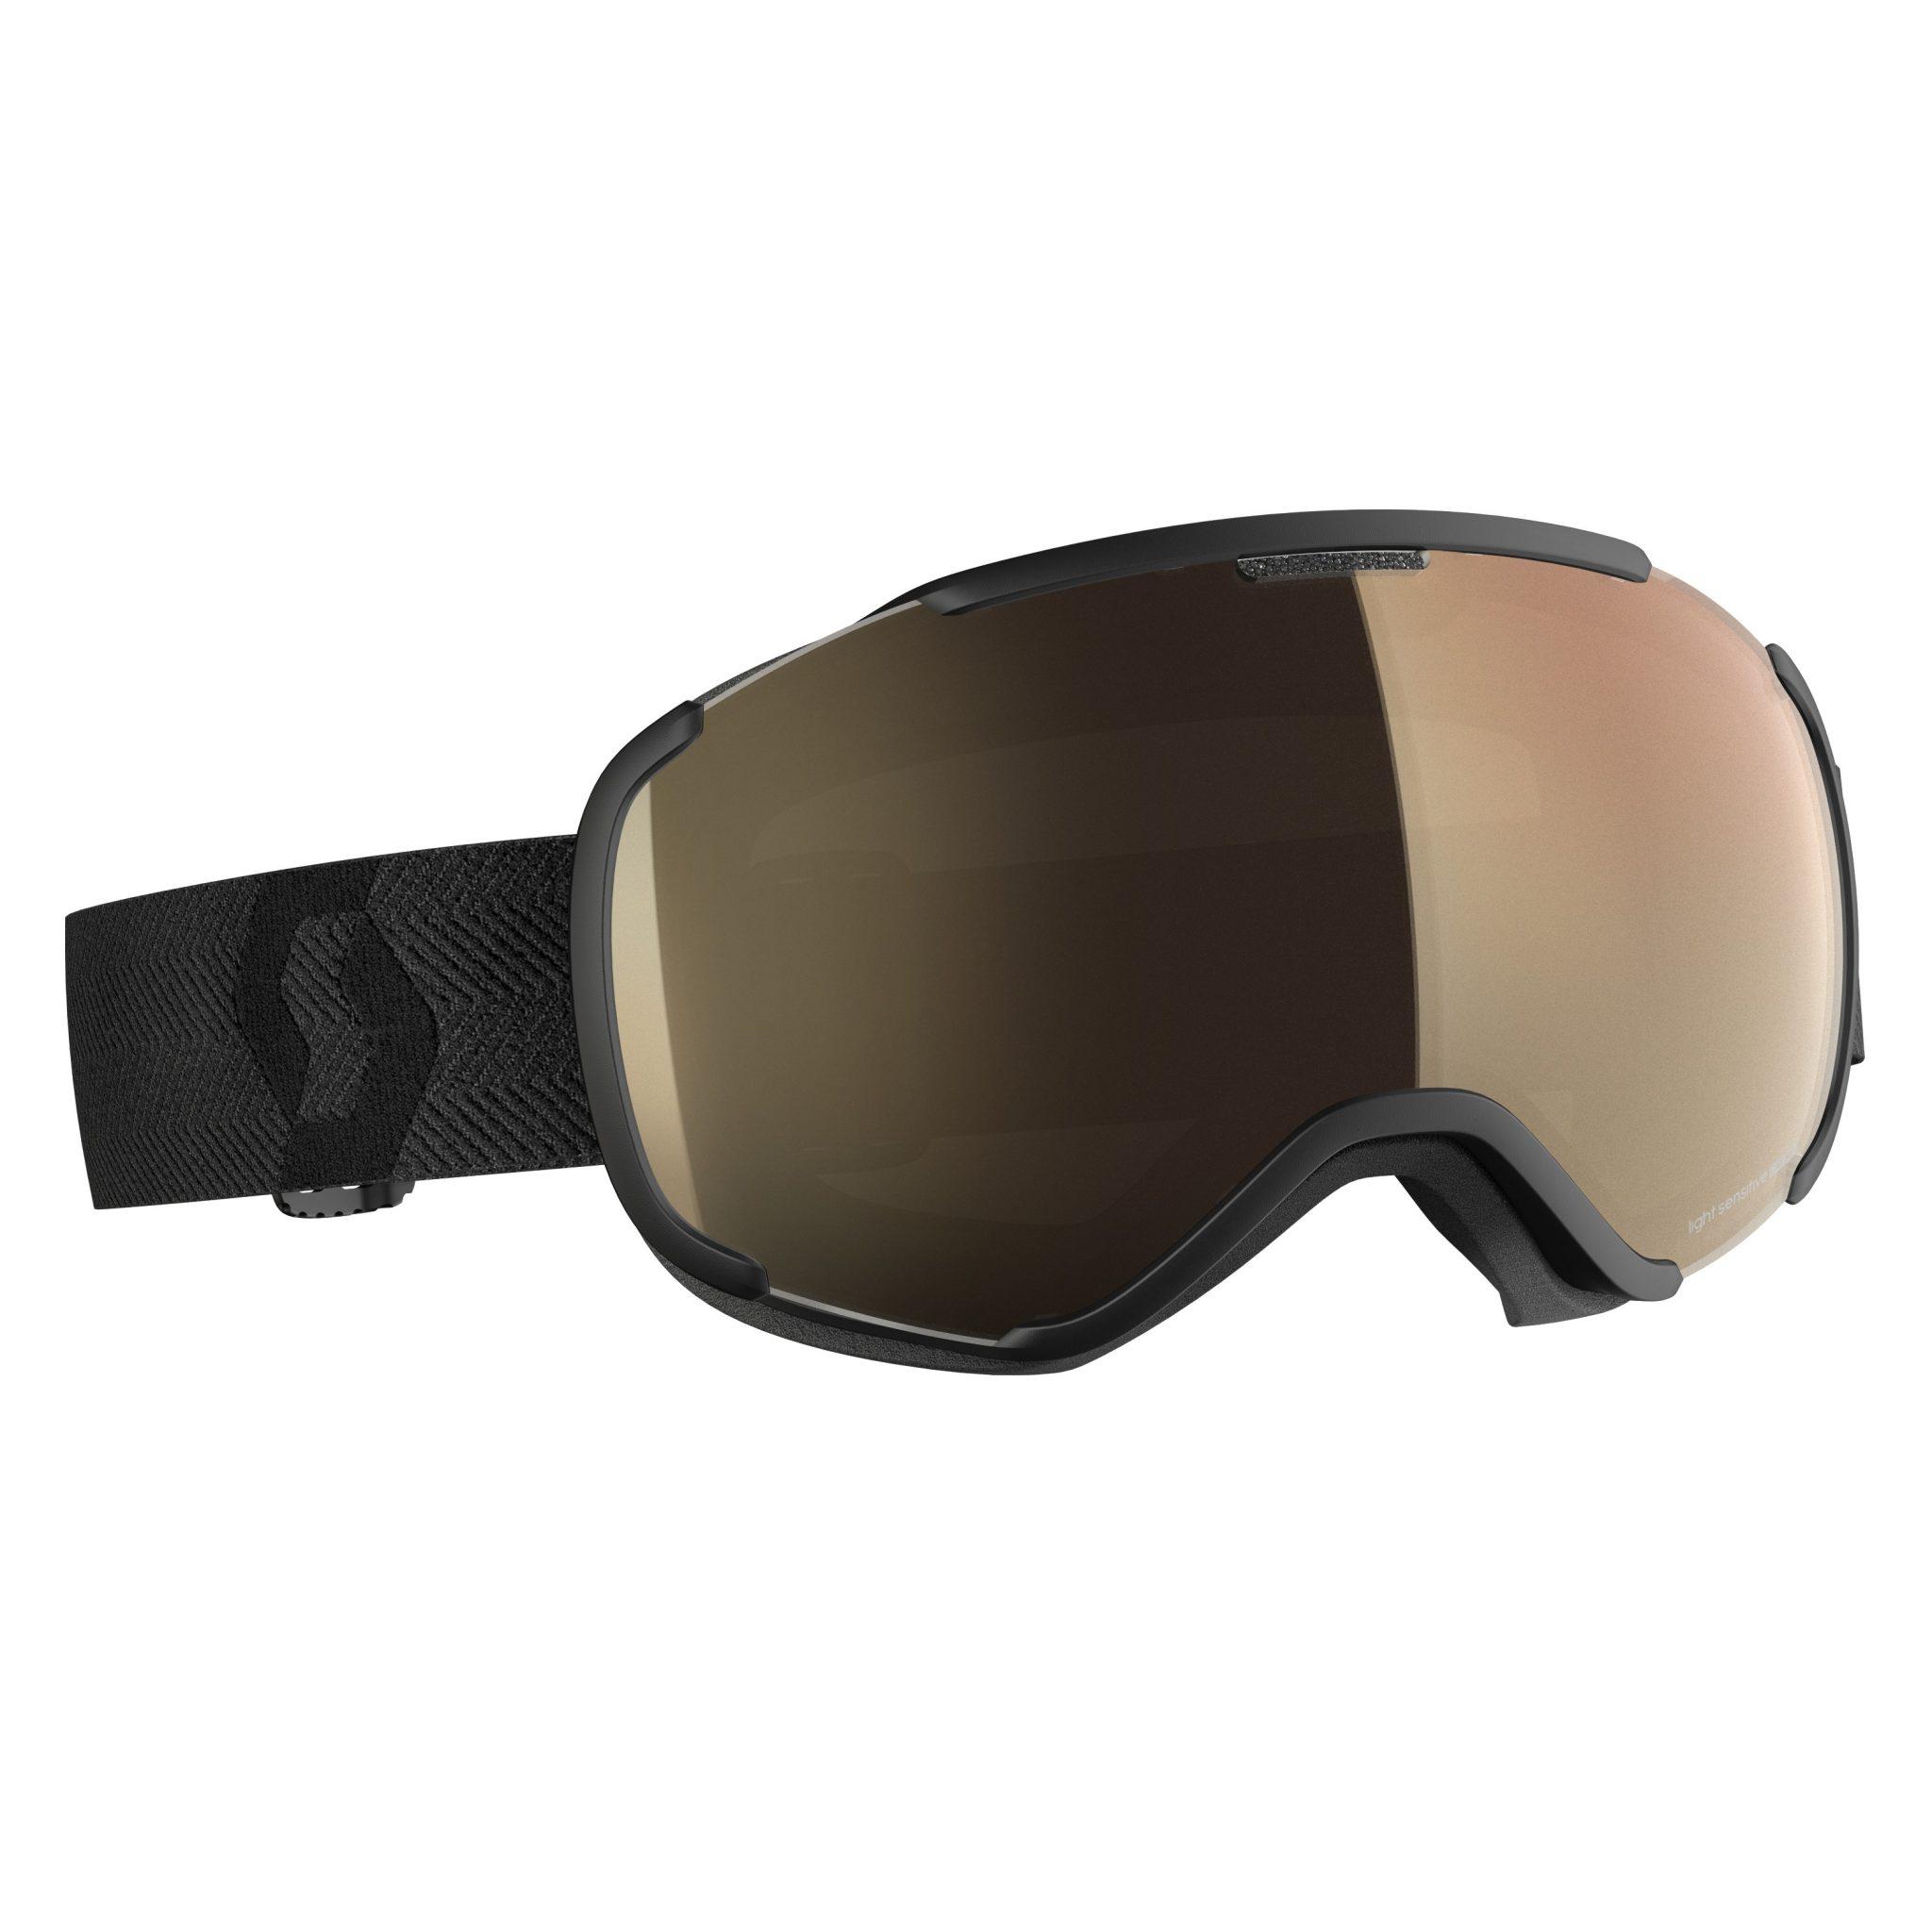 Scott Faze II Light Sensitive Goggle - Black LS Bronze Chrome - Front View